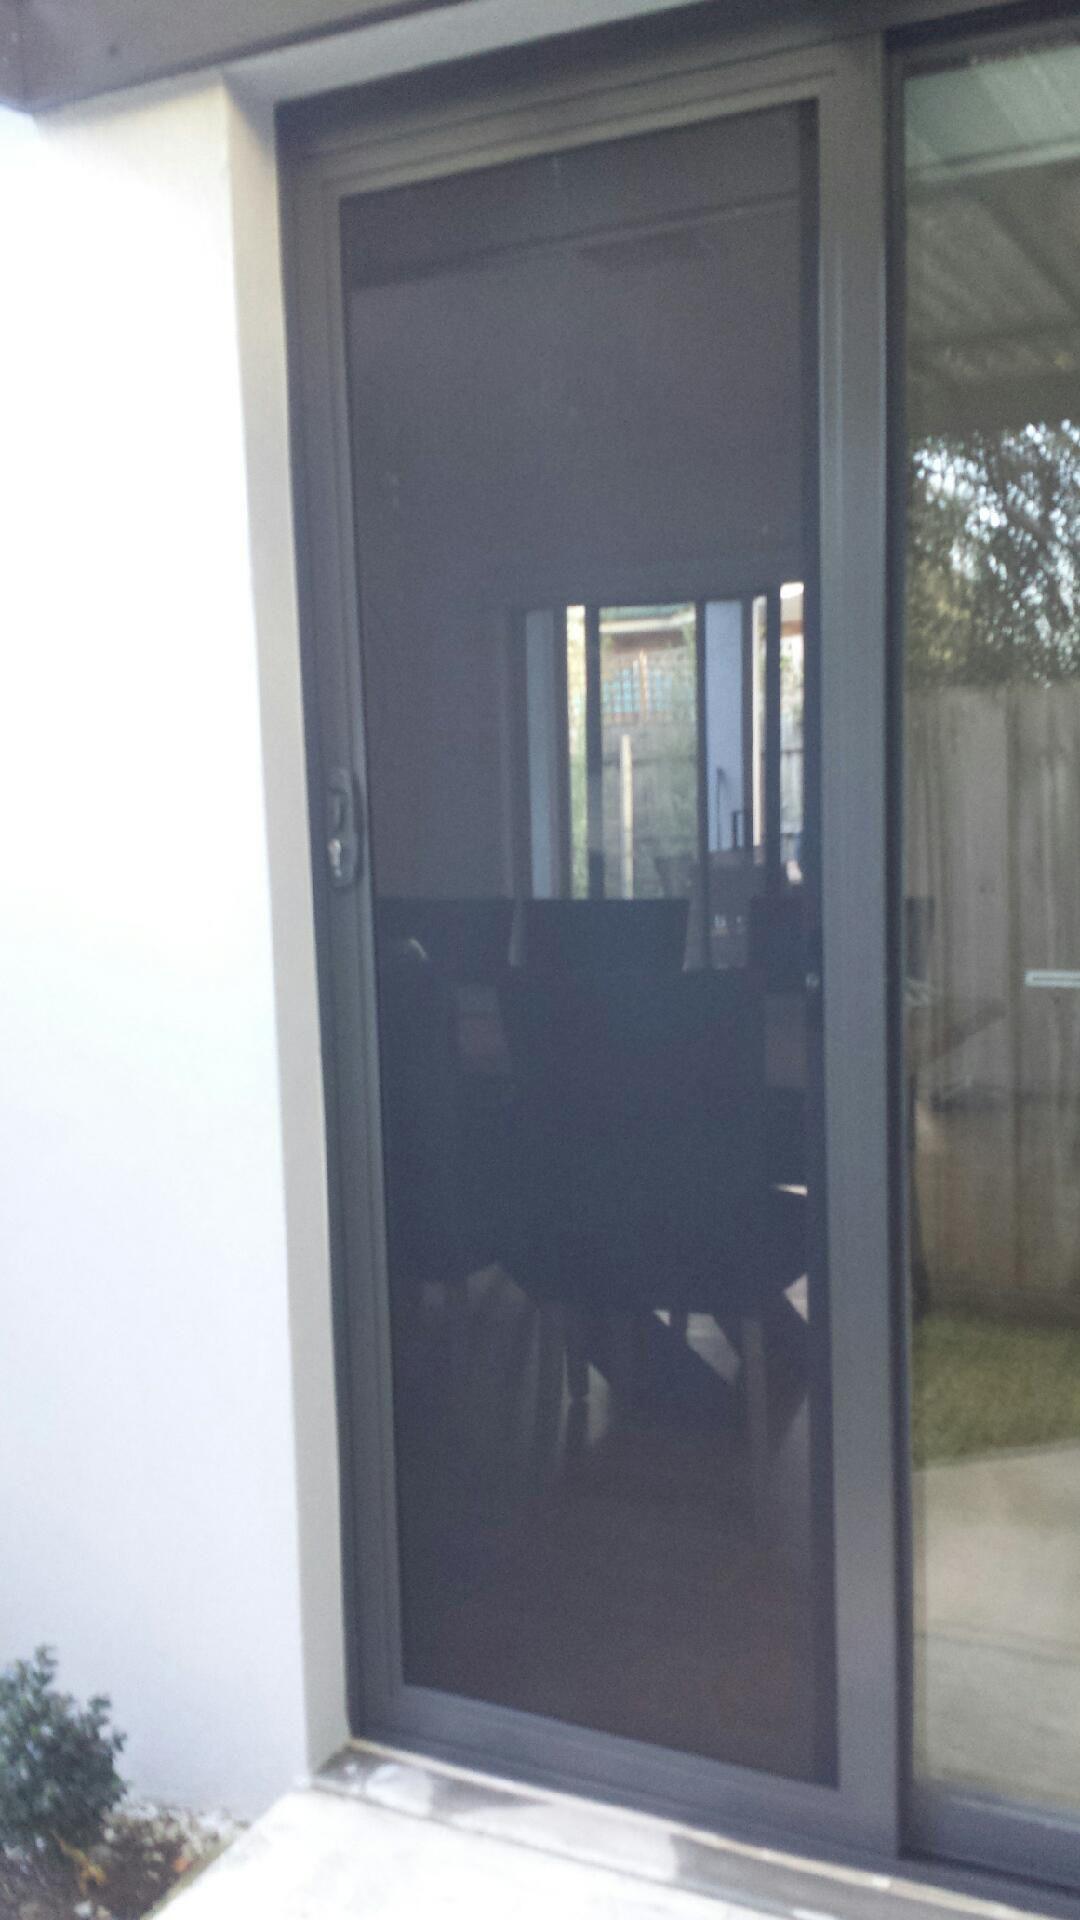 Aluminium frame sliding security screen door with